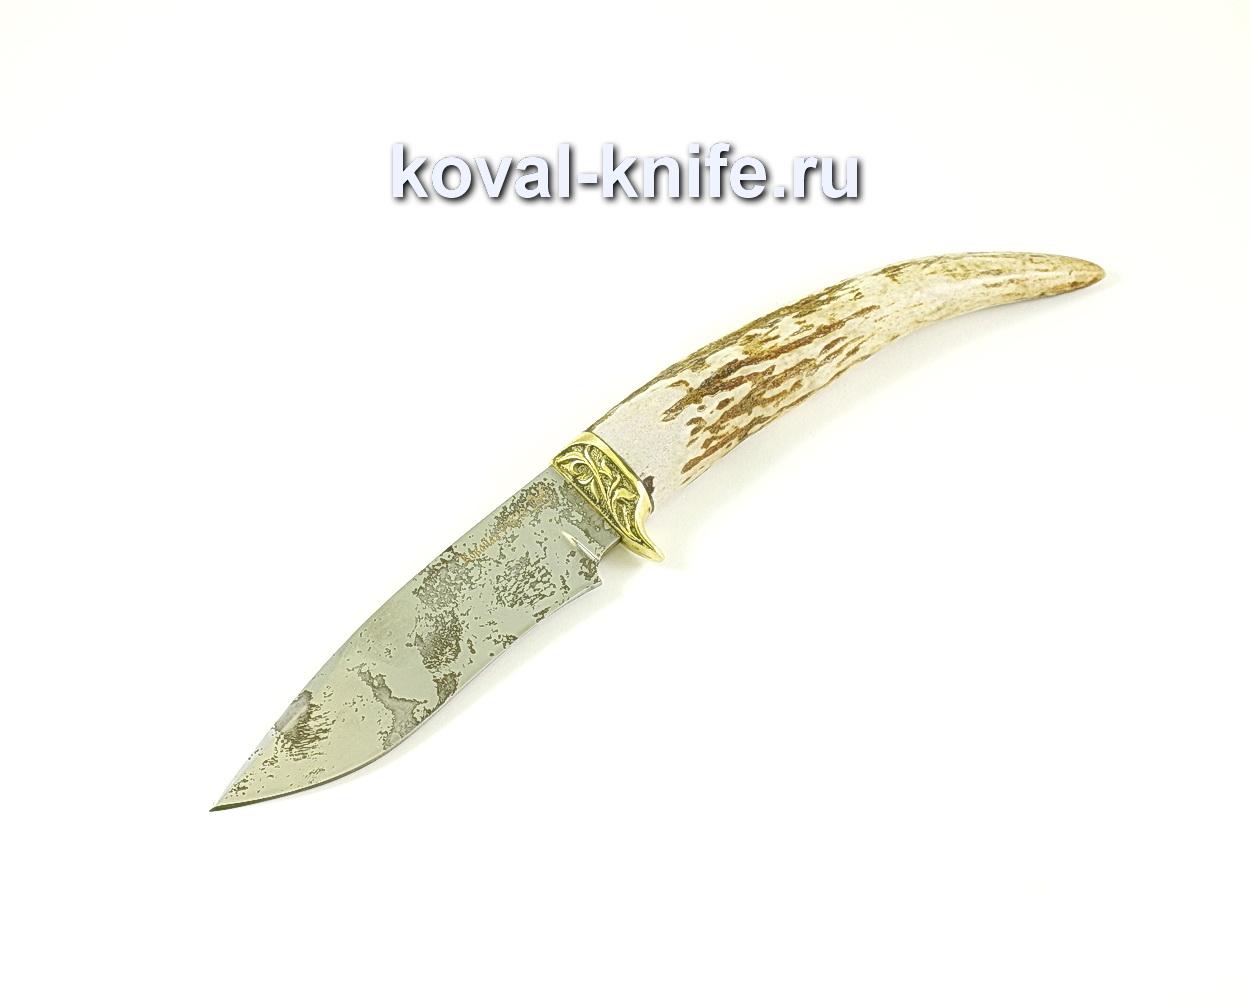 Нож Сапсан (сталь 95х18), рукоять рог, литье A263